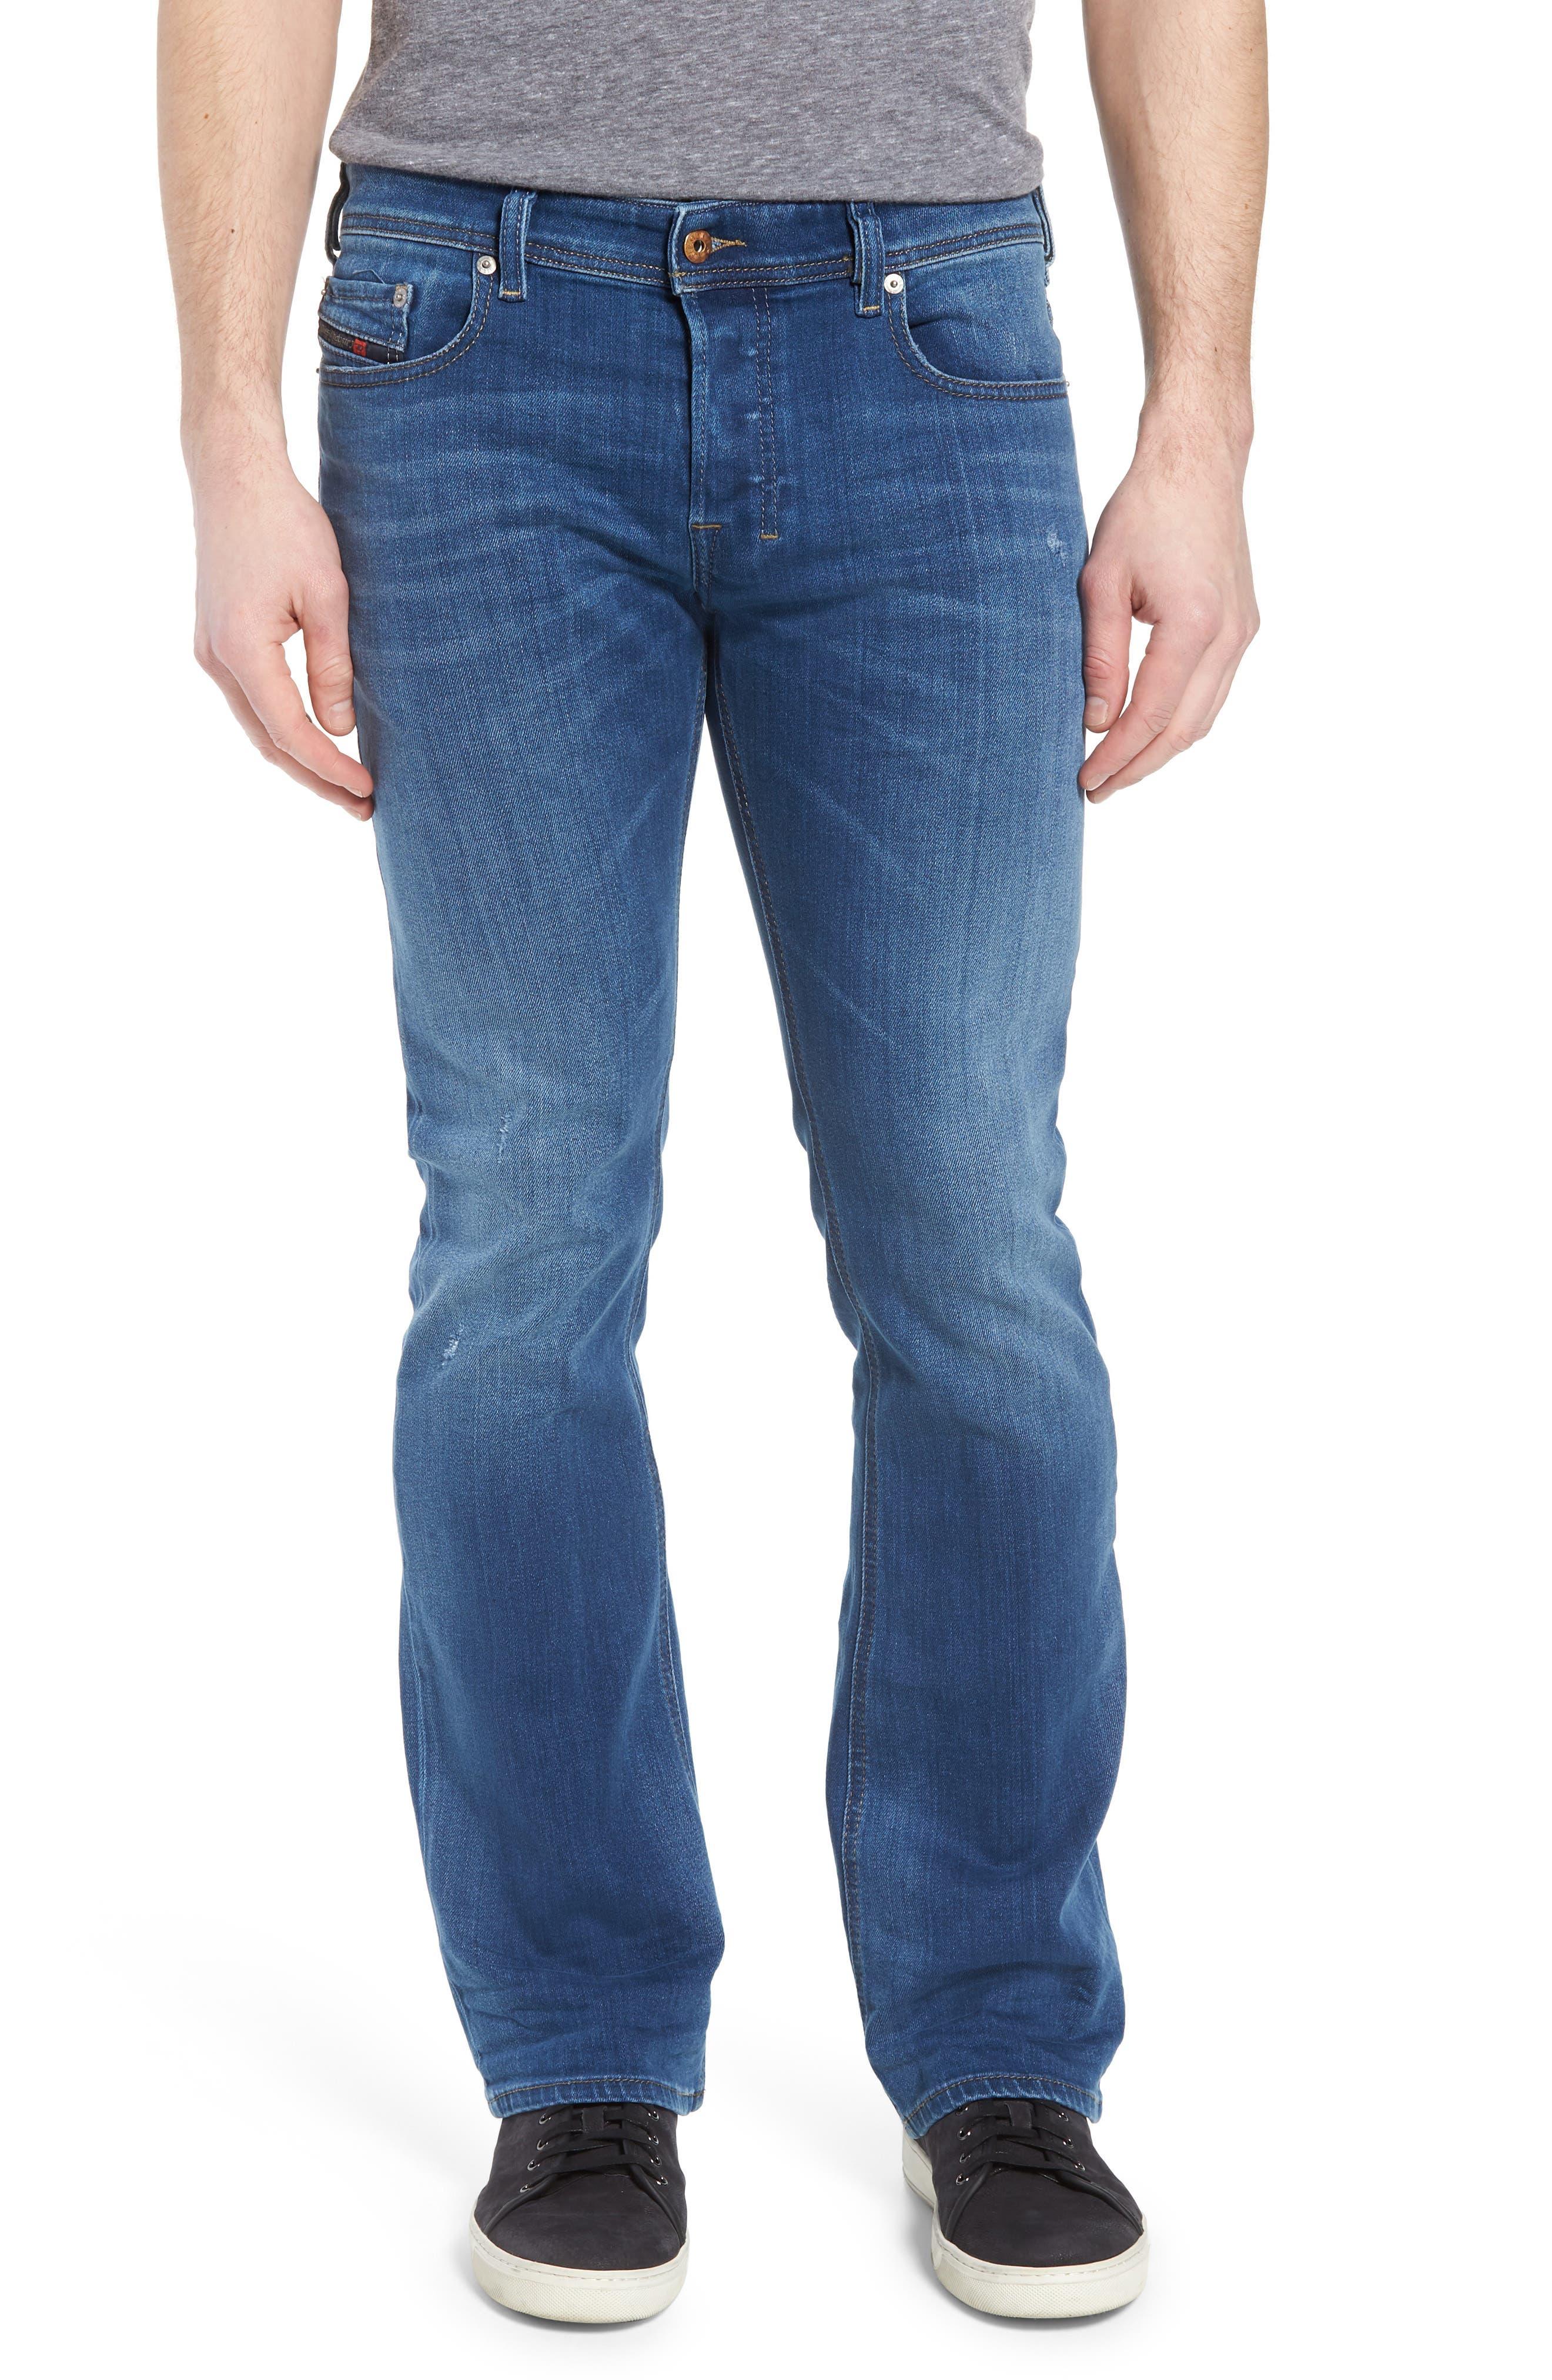 Zatiny Bootcut Jeans,                             Main thumbnail 1, color,                             084Qq